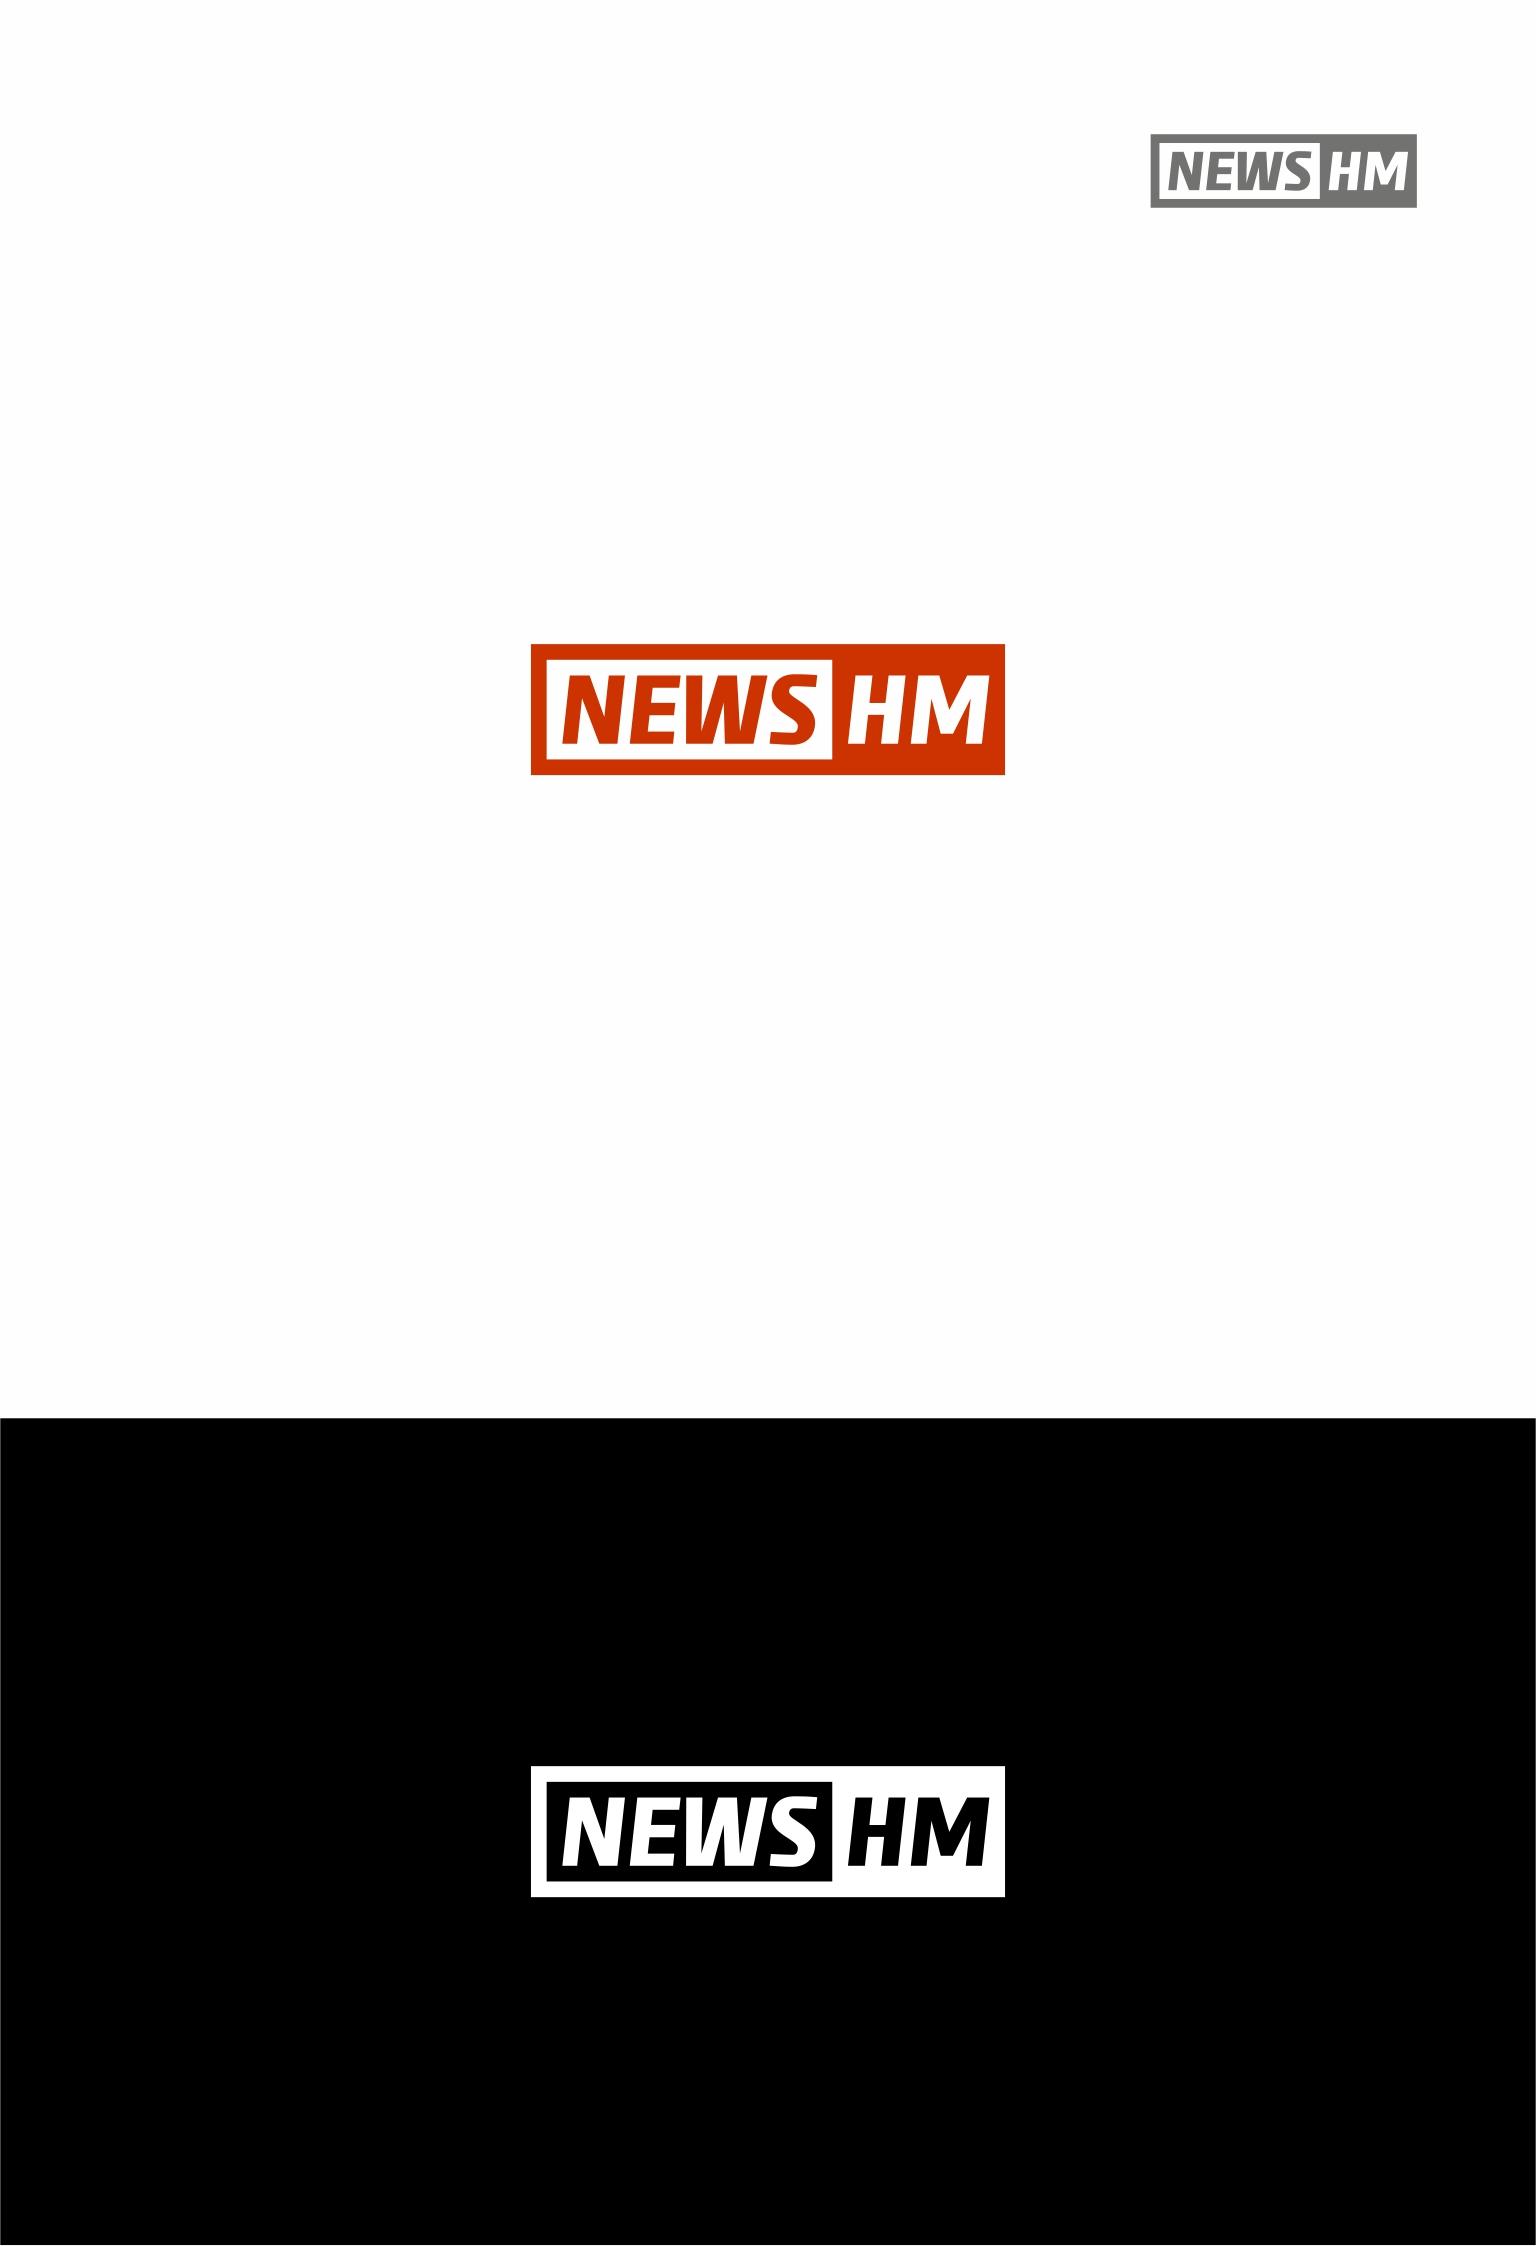 Логотип для информационного агентства фото f_3525aa37b35f16cf.jpg